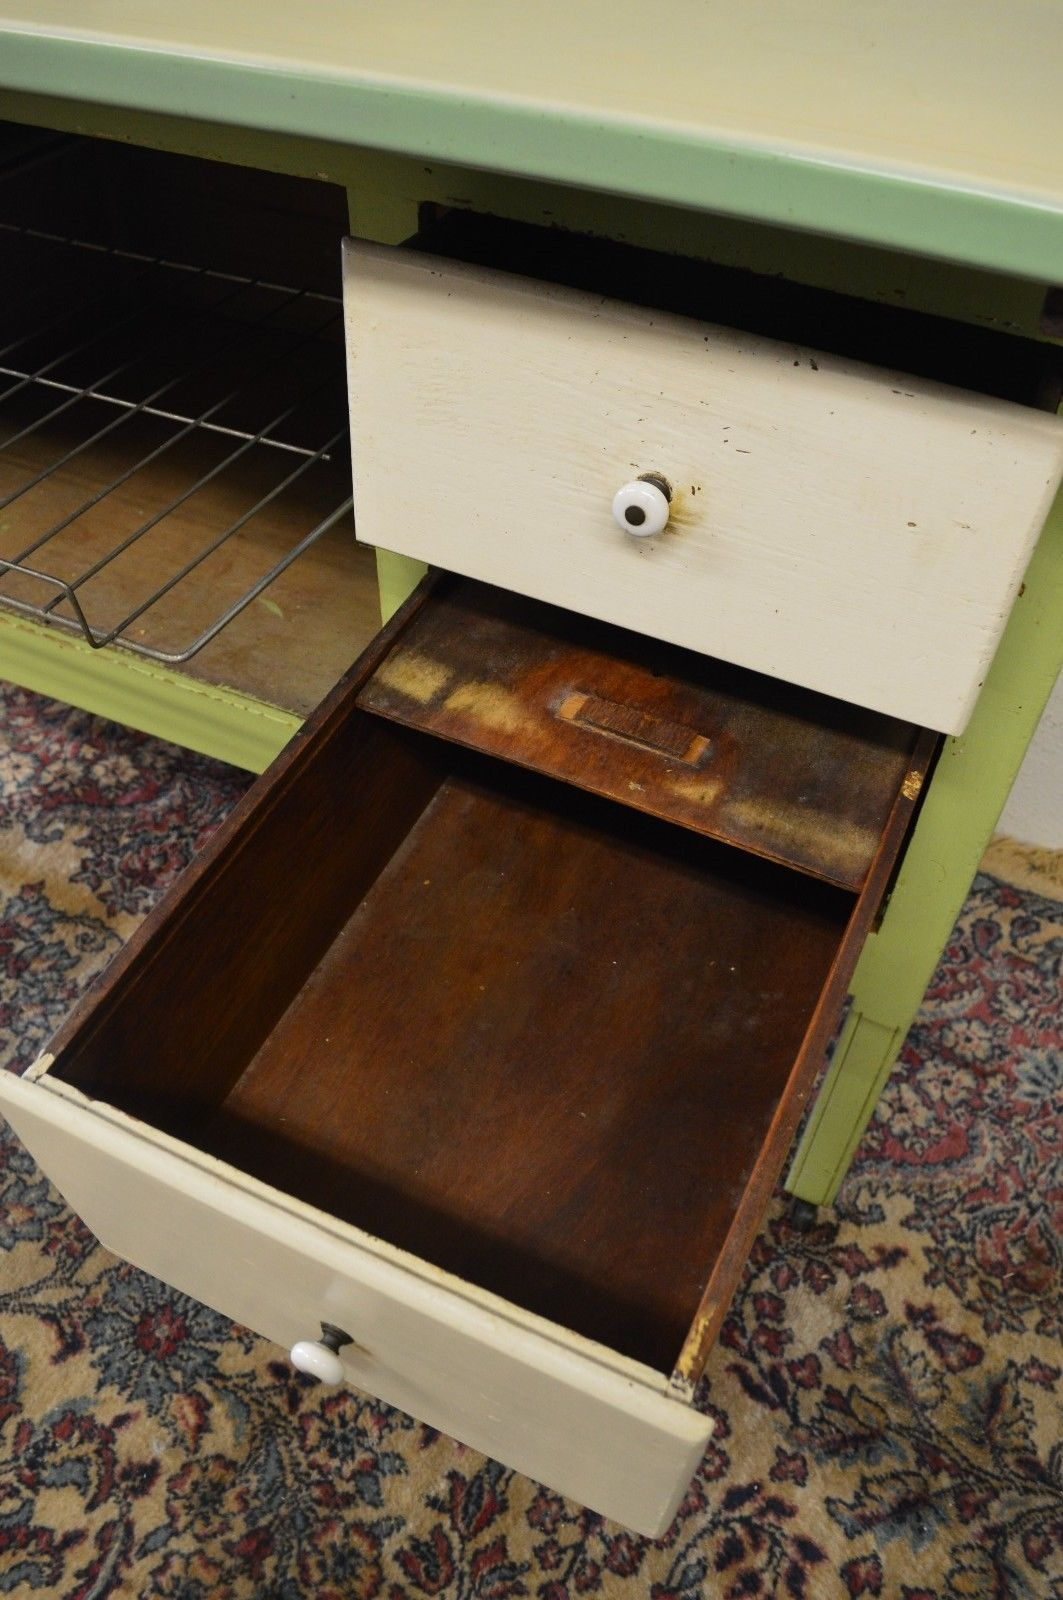 Antique 1920's Hoosier Cabinet with Flour Sifter Porcelain Top ...